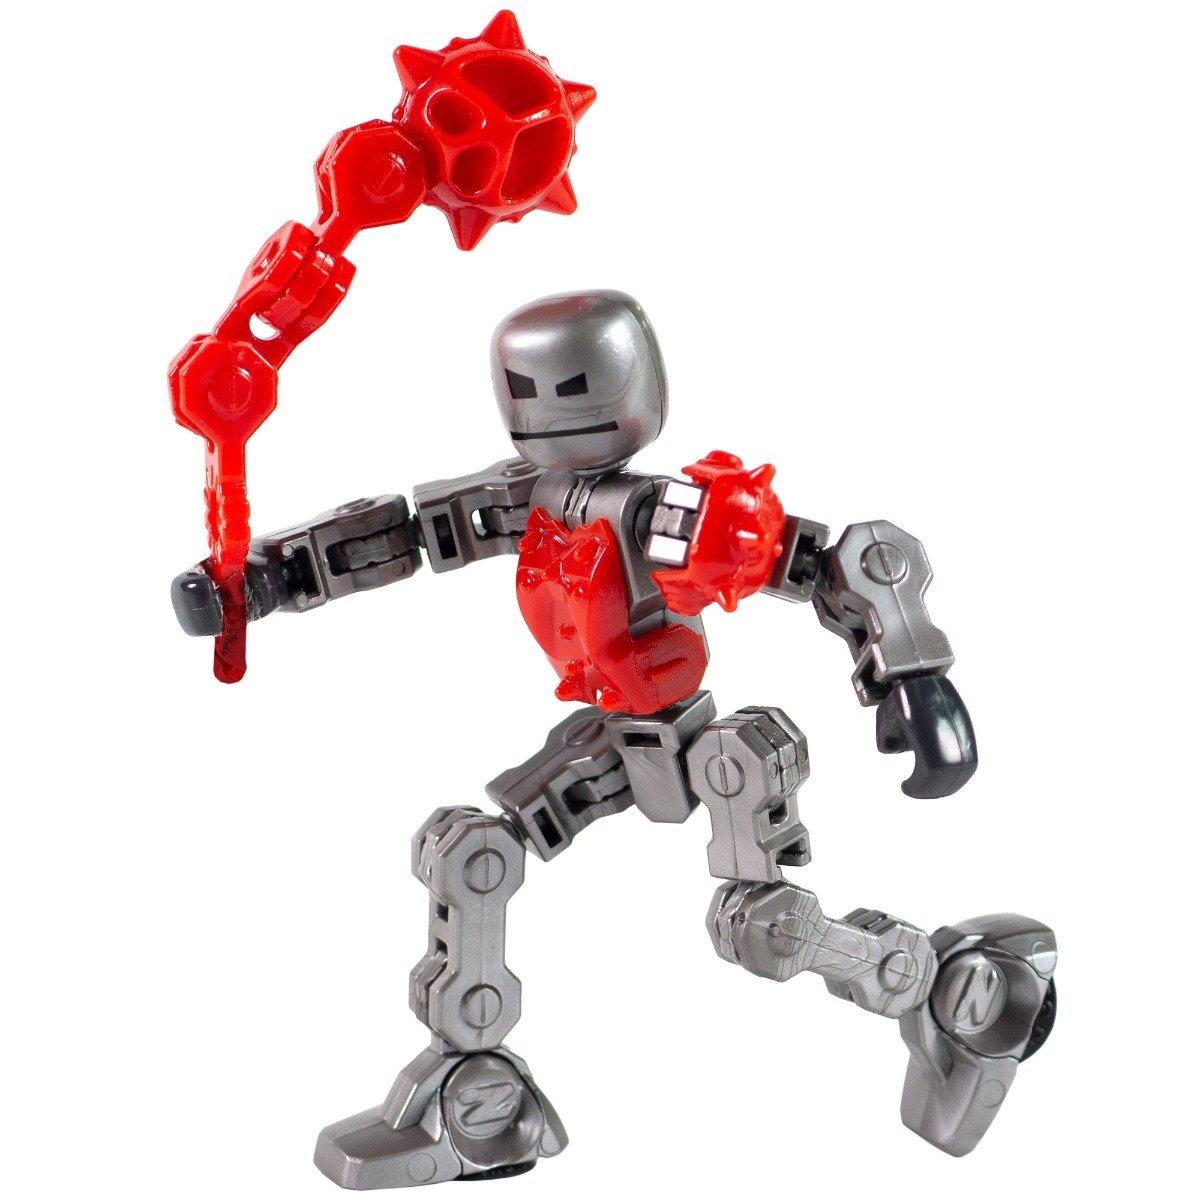 Figurina Robot articulat transformabil KlikBot, Thrash